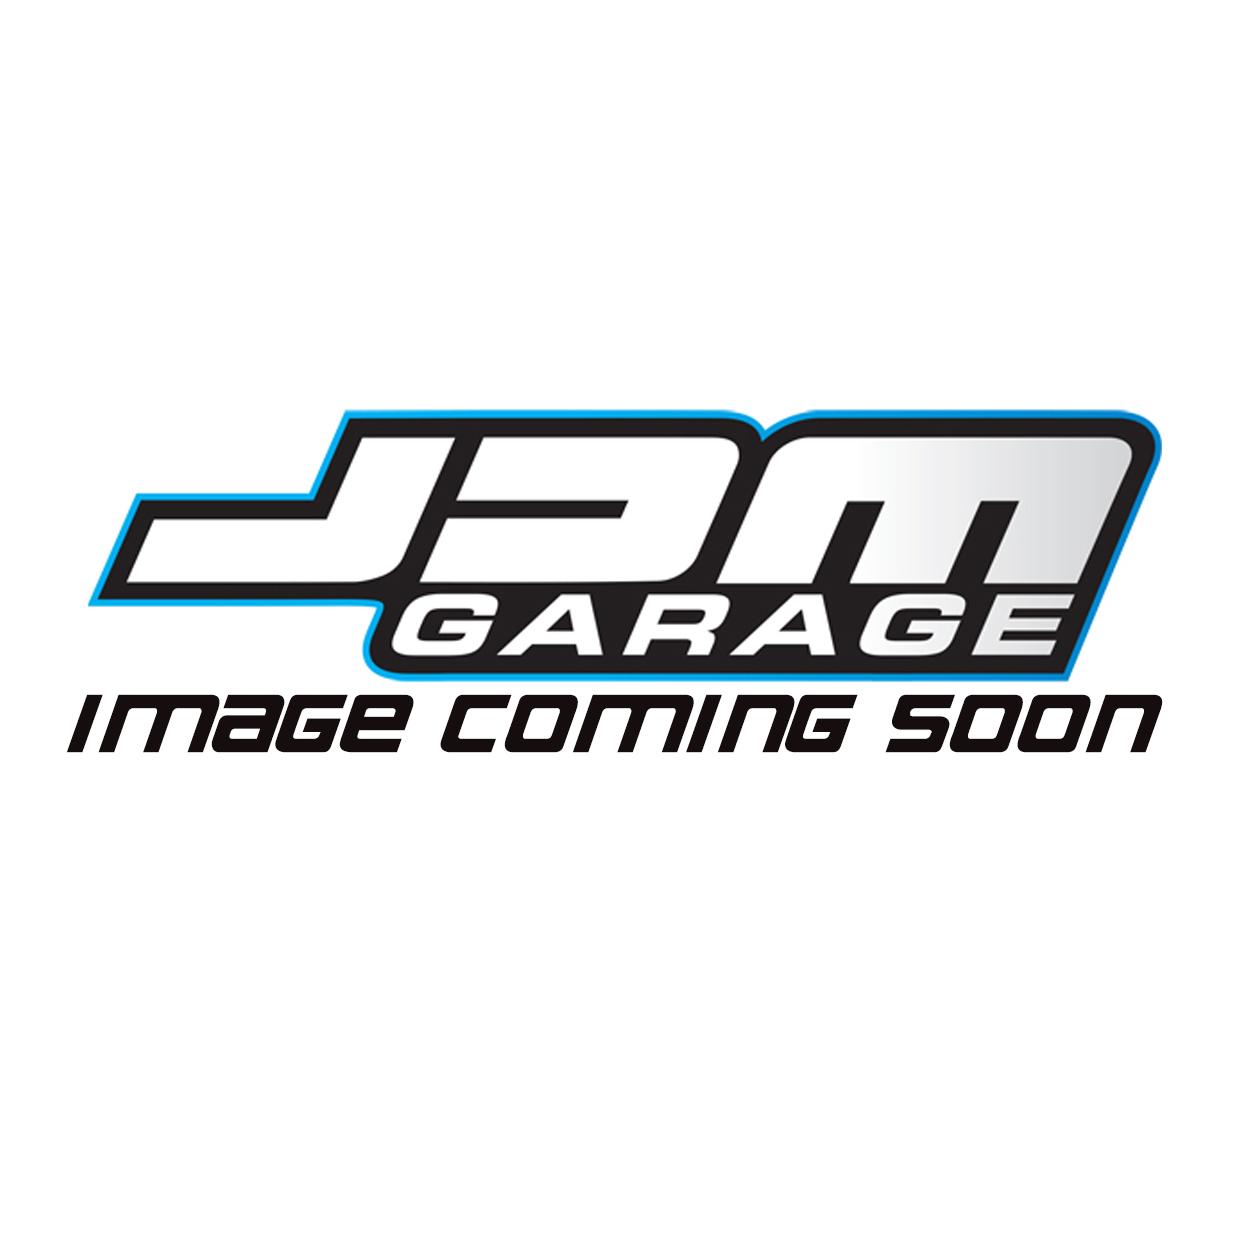 Genuine Nissan Standard Water Pump - Skyline RB20 RB25 RB26 - 21010-21U26 / 21010-70TY5